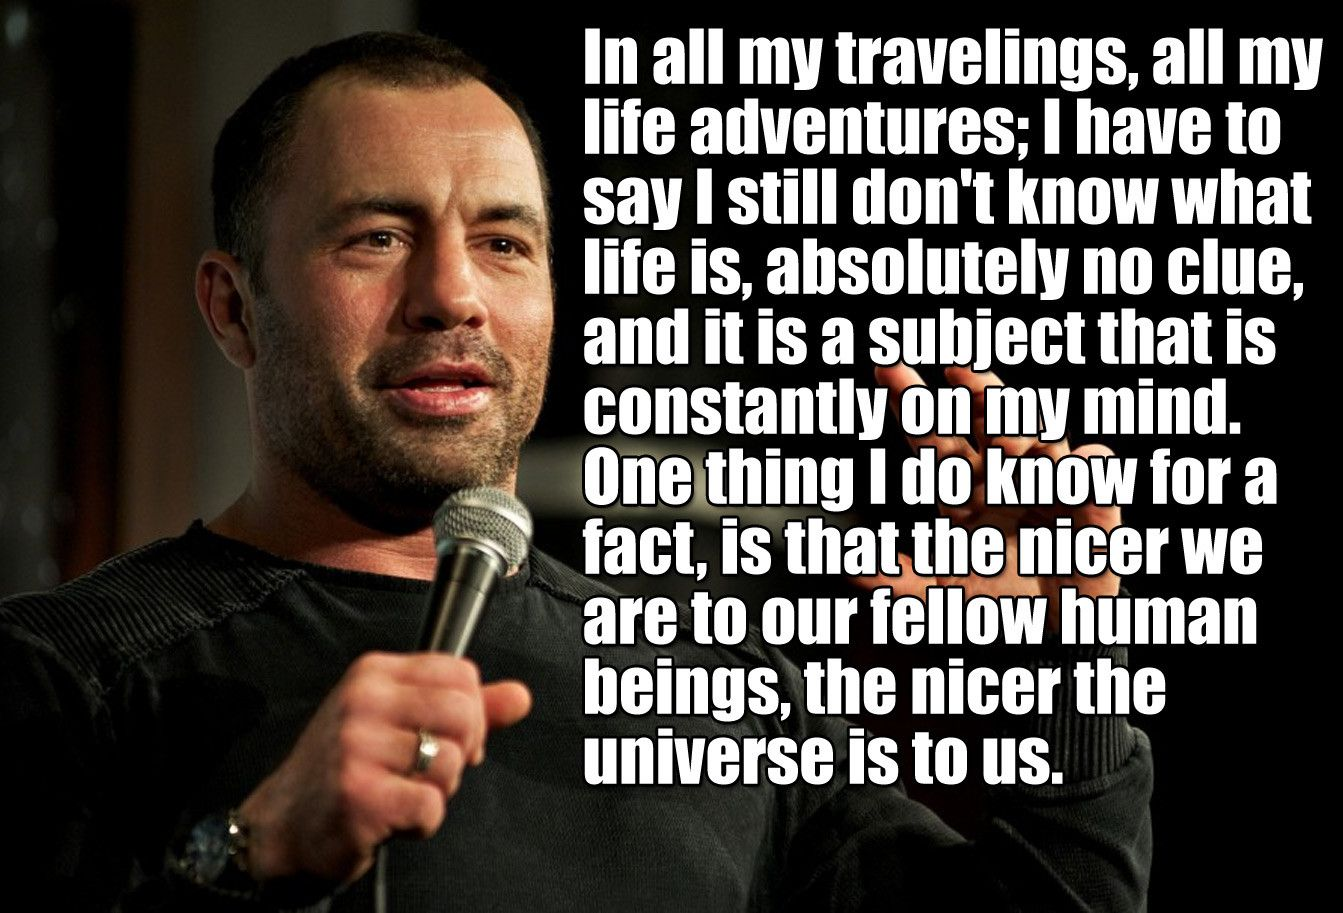 Some Deep Shit Joe Rogan Said When I Saw Him Live Life Quotes Joe Rogan Quotes Life Facts